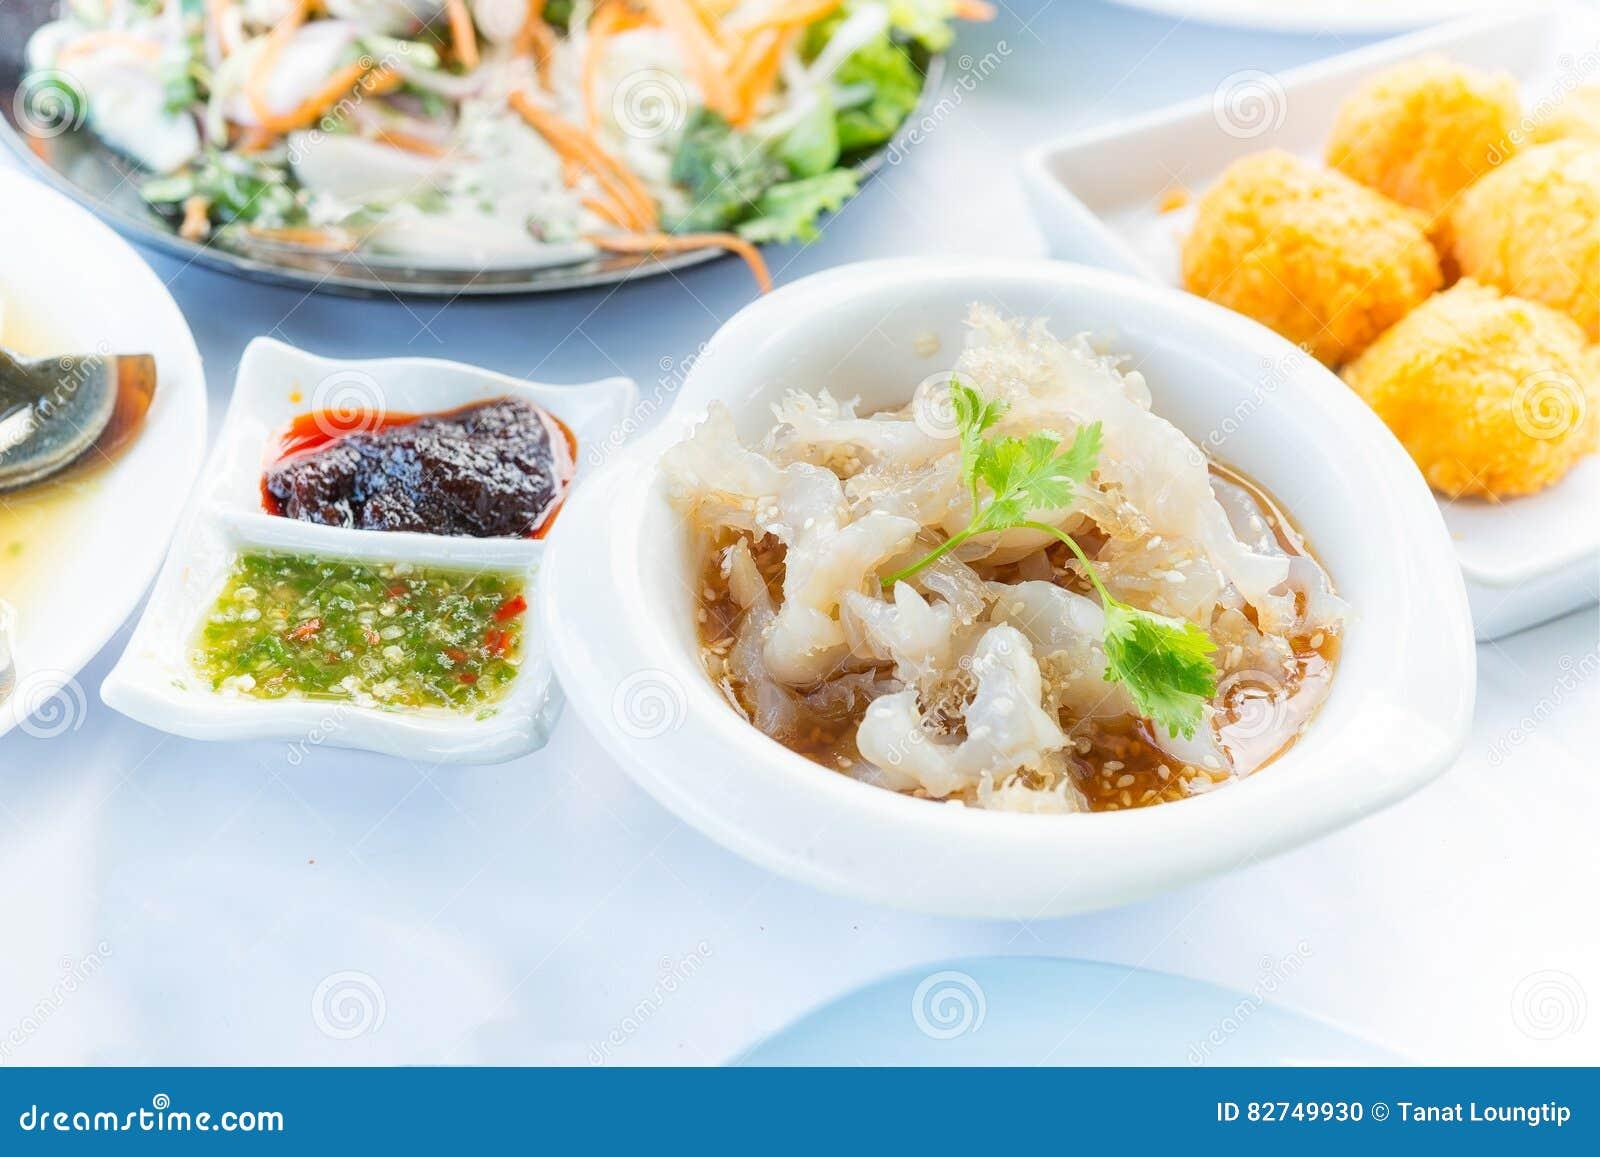 Japanse kwallensalade, kruidige die schotel algemeen in restaura wordt gediend